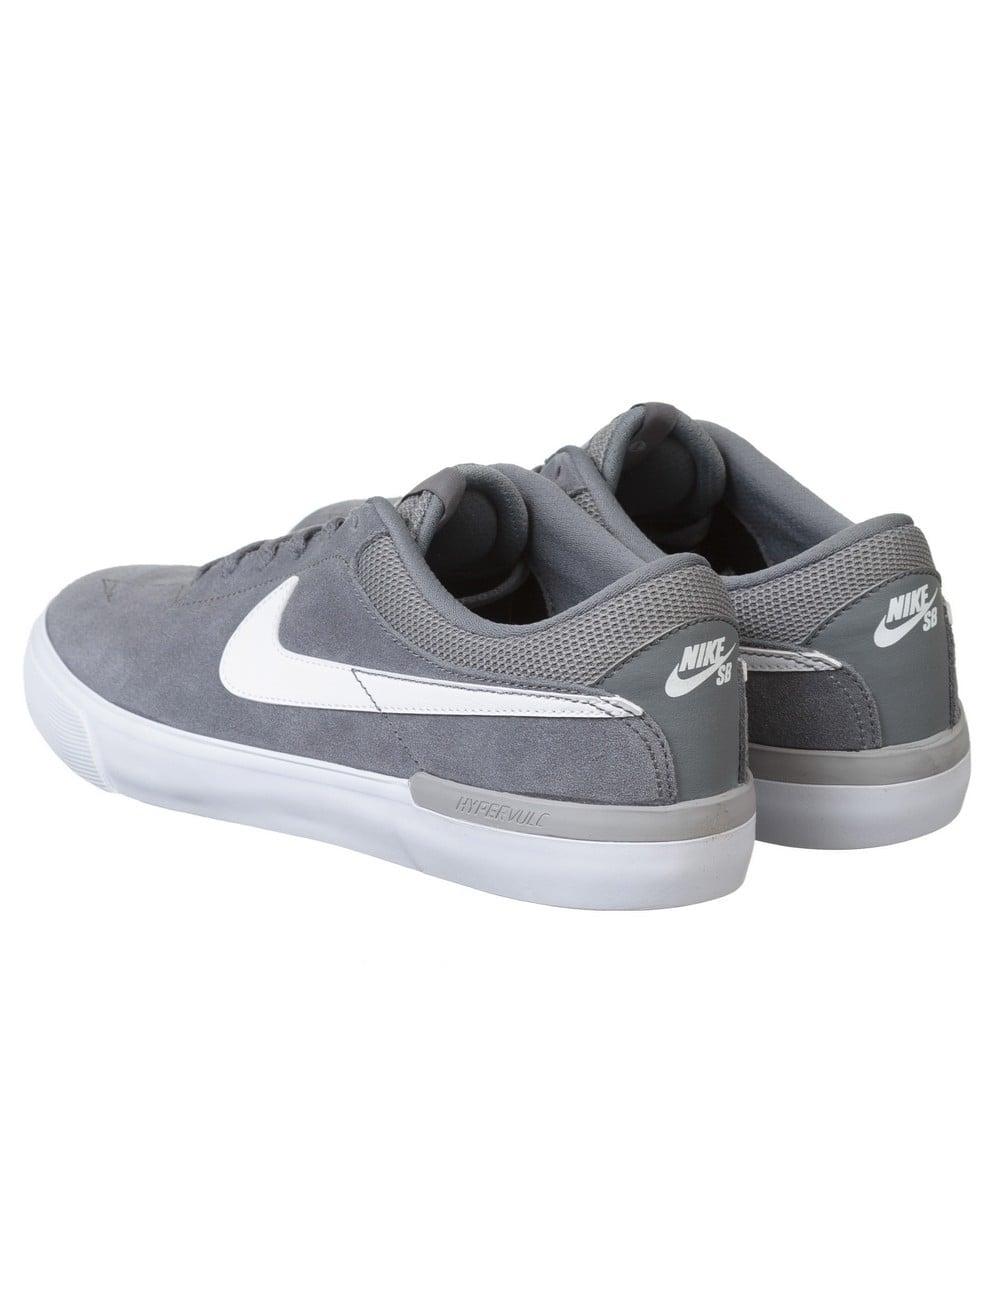 Nike SB Eric Koston Hypervulc Shoes - Cool Grey/White - Footwear ...